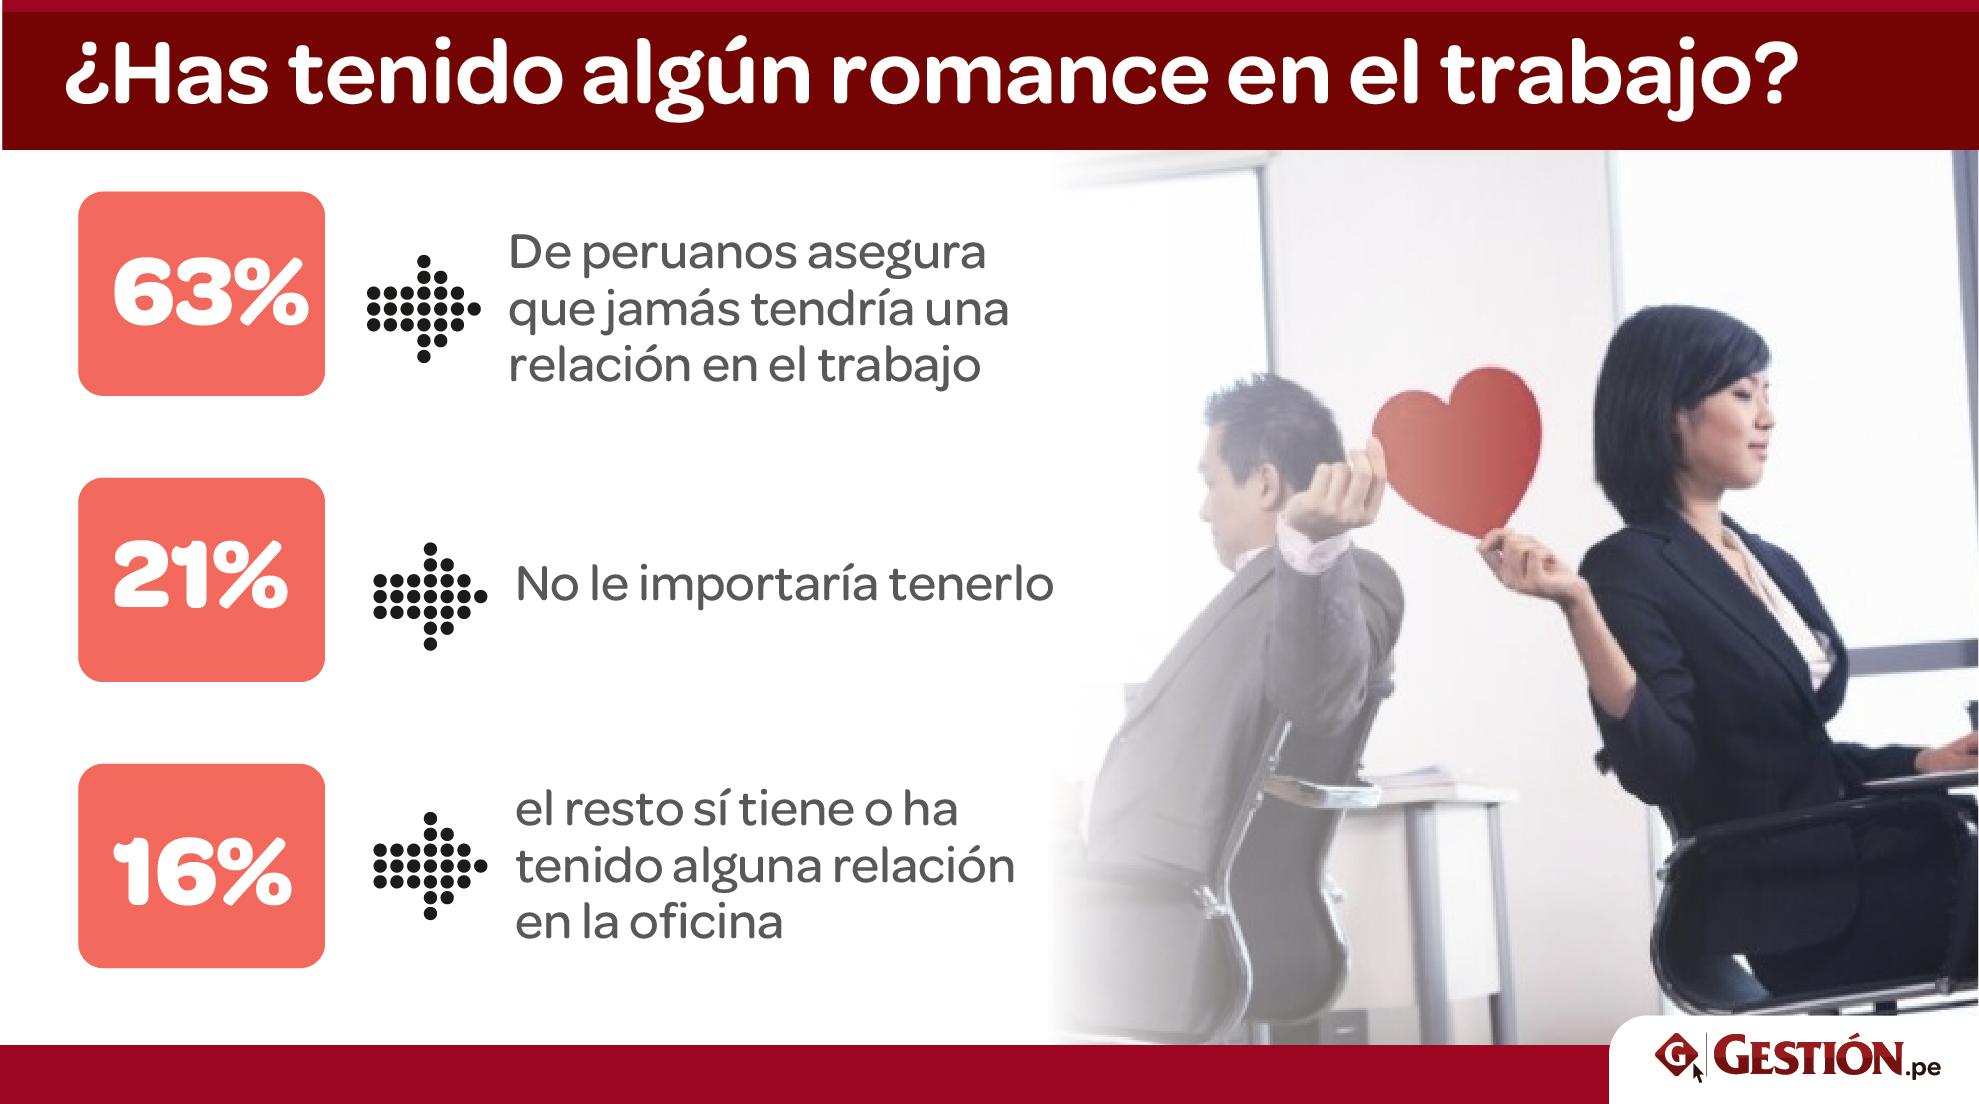 empleo, trabajo, peruanos, oficina, San Valentín, amor, buenos o malos